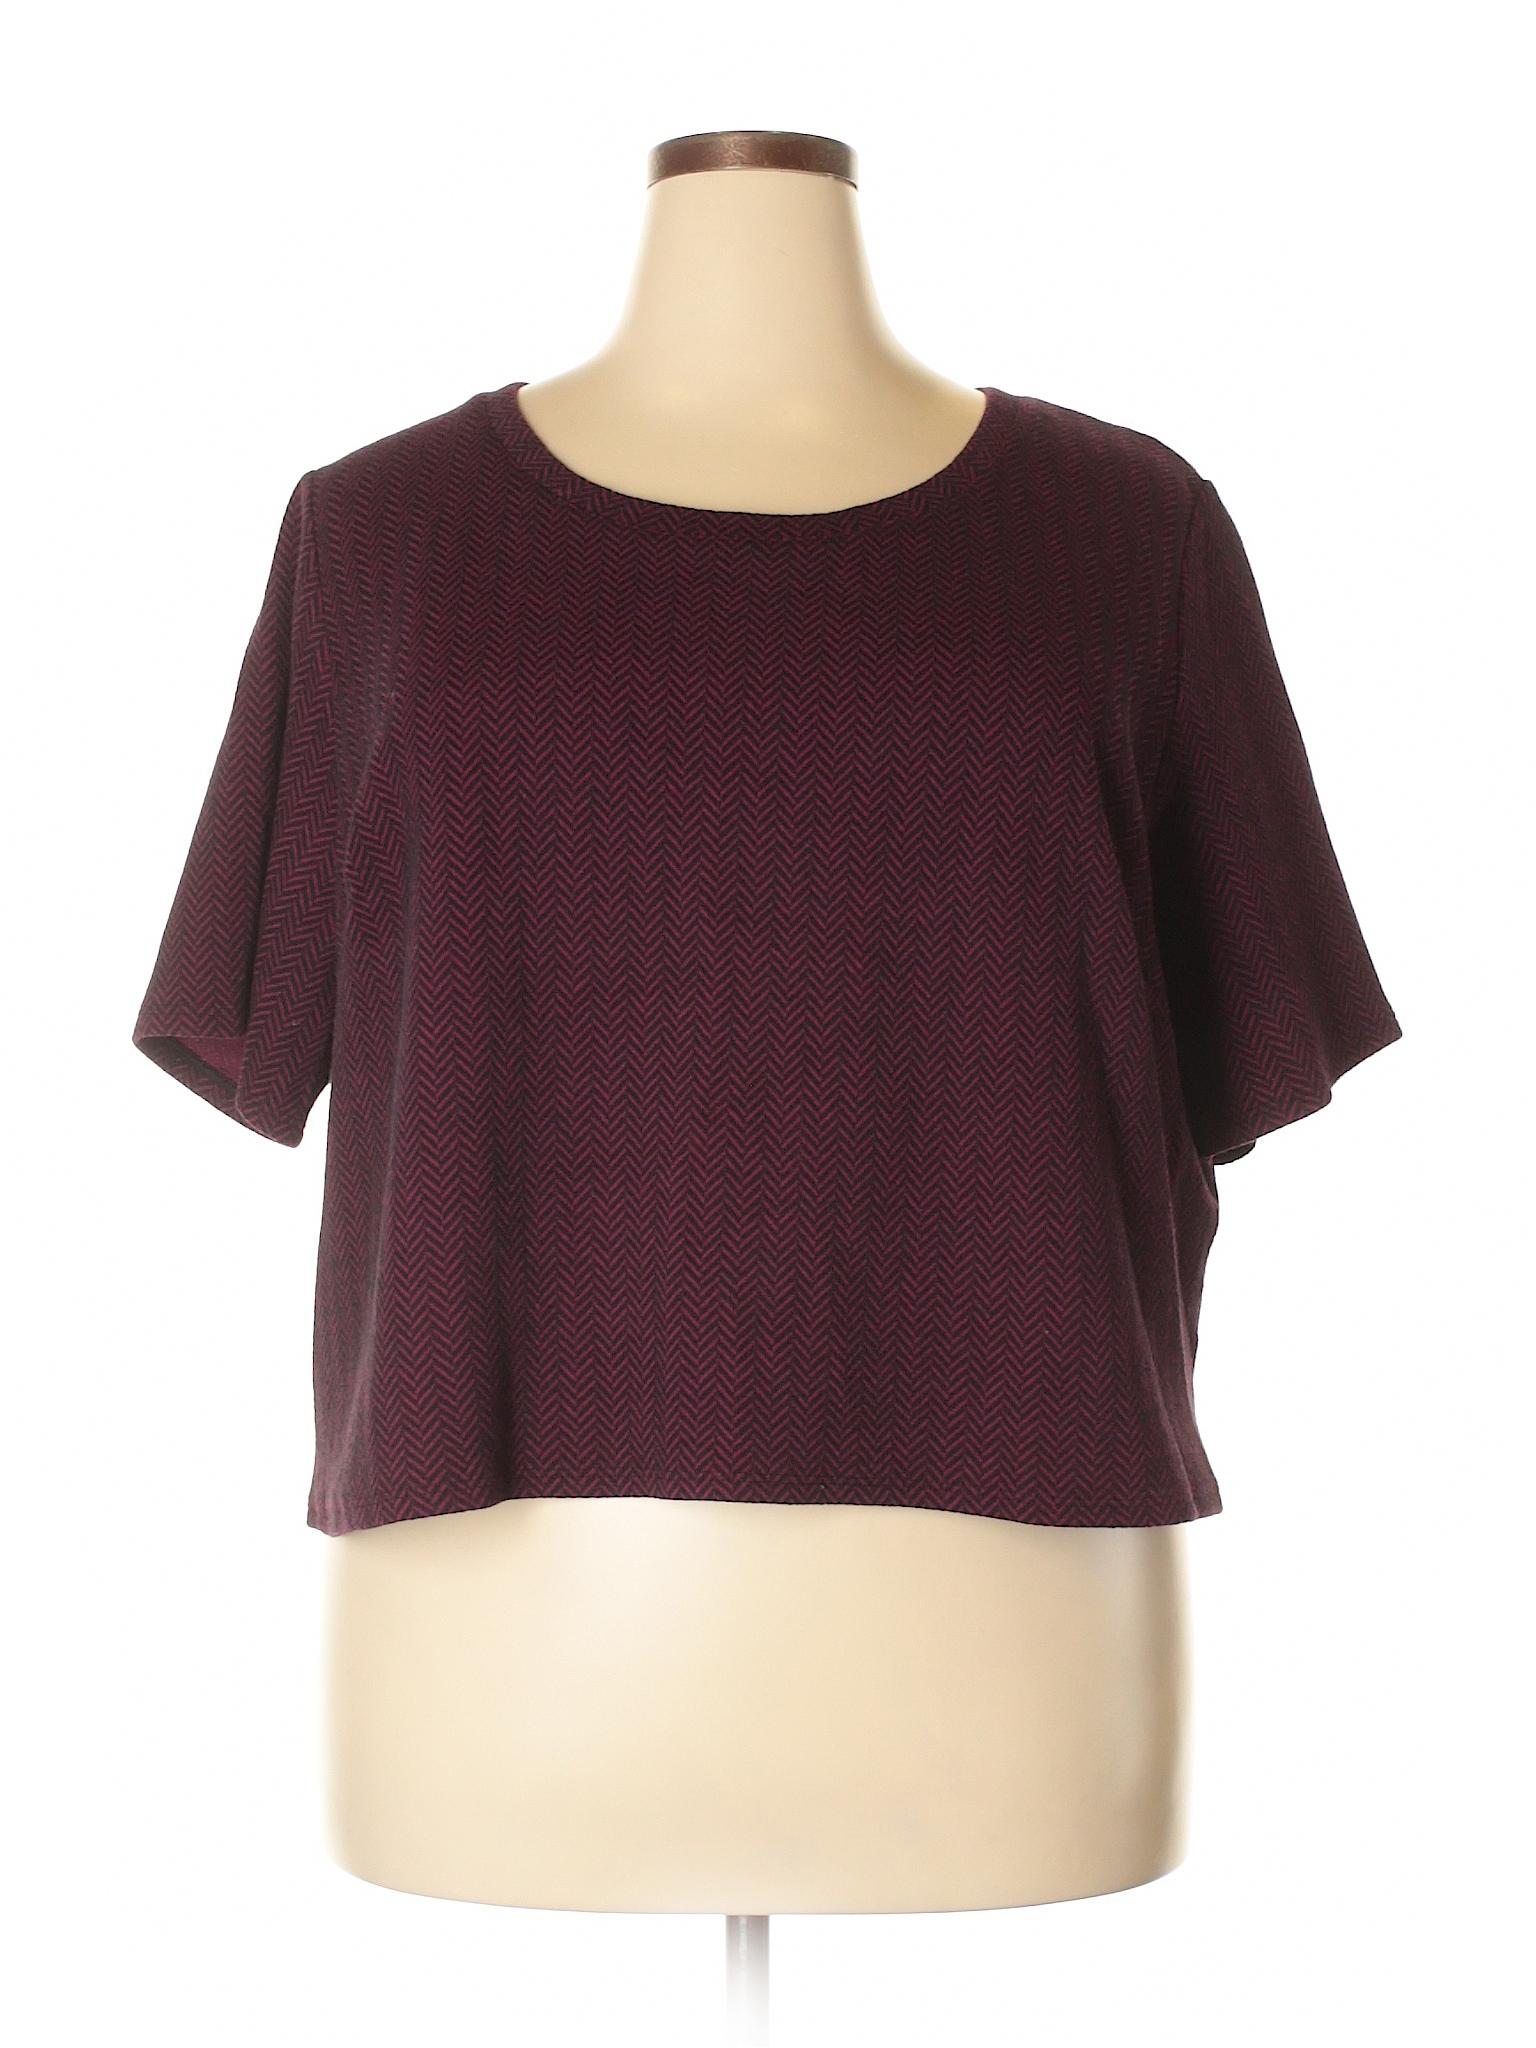 amp; Pullover Boutique Sweater Ava Viv AgR51w